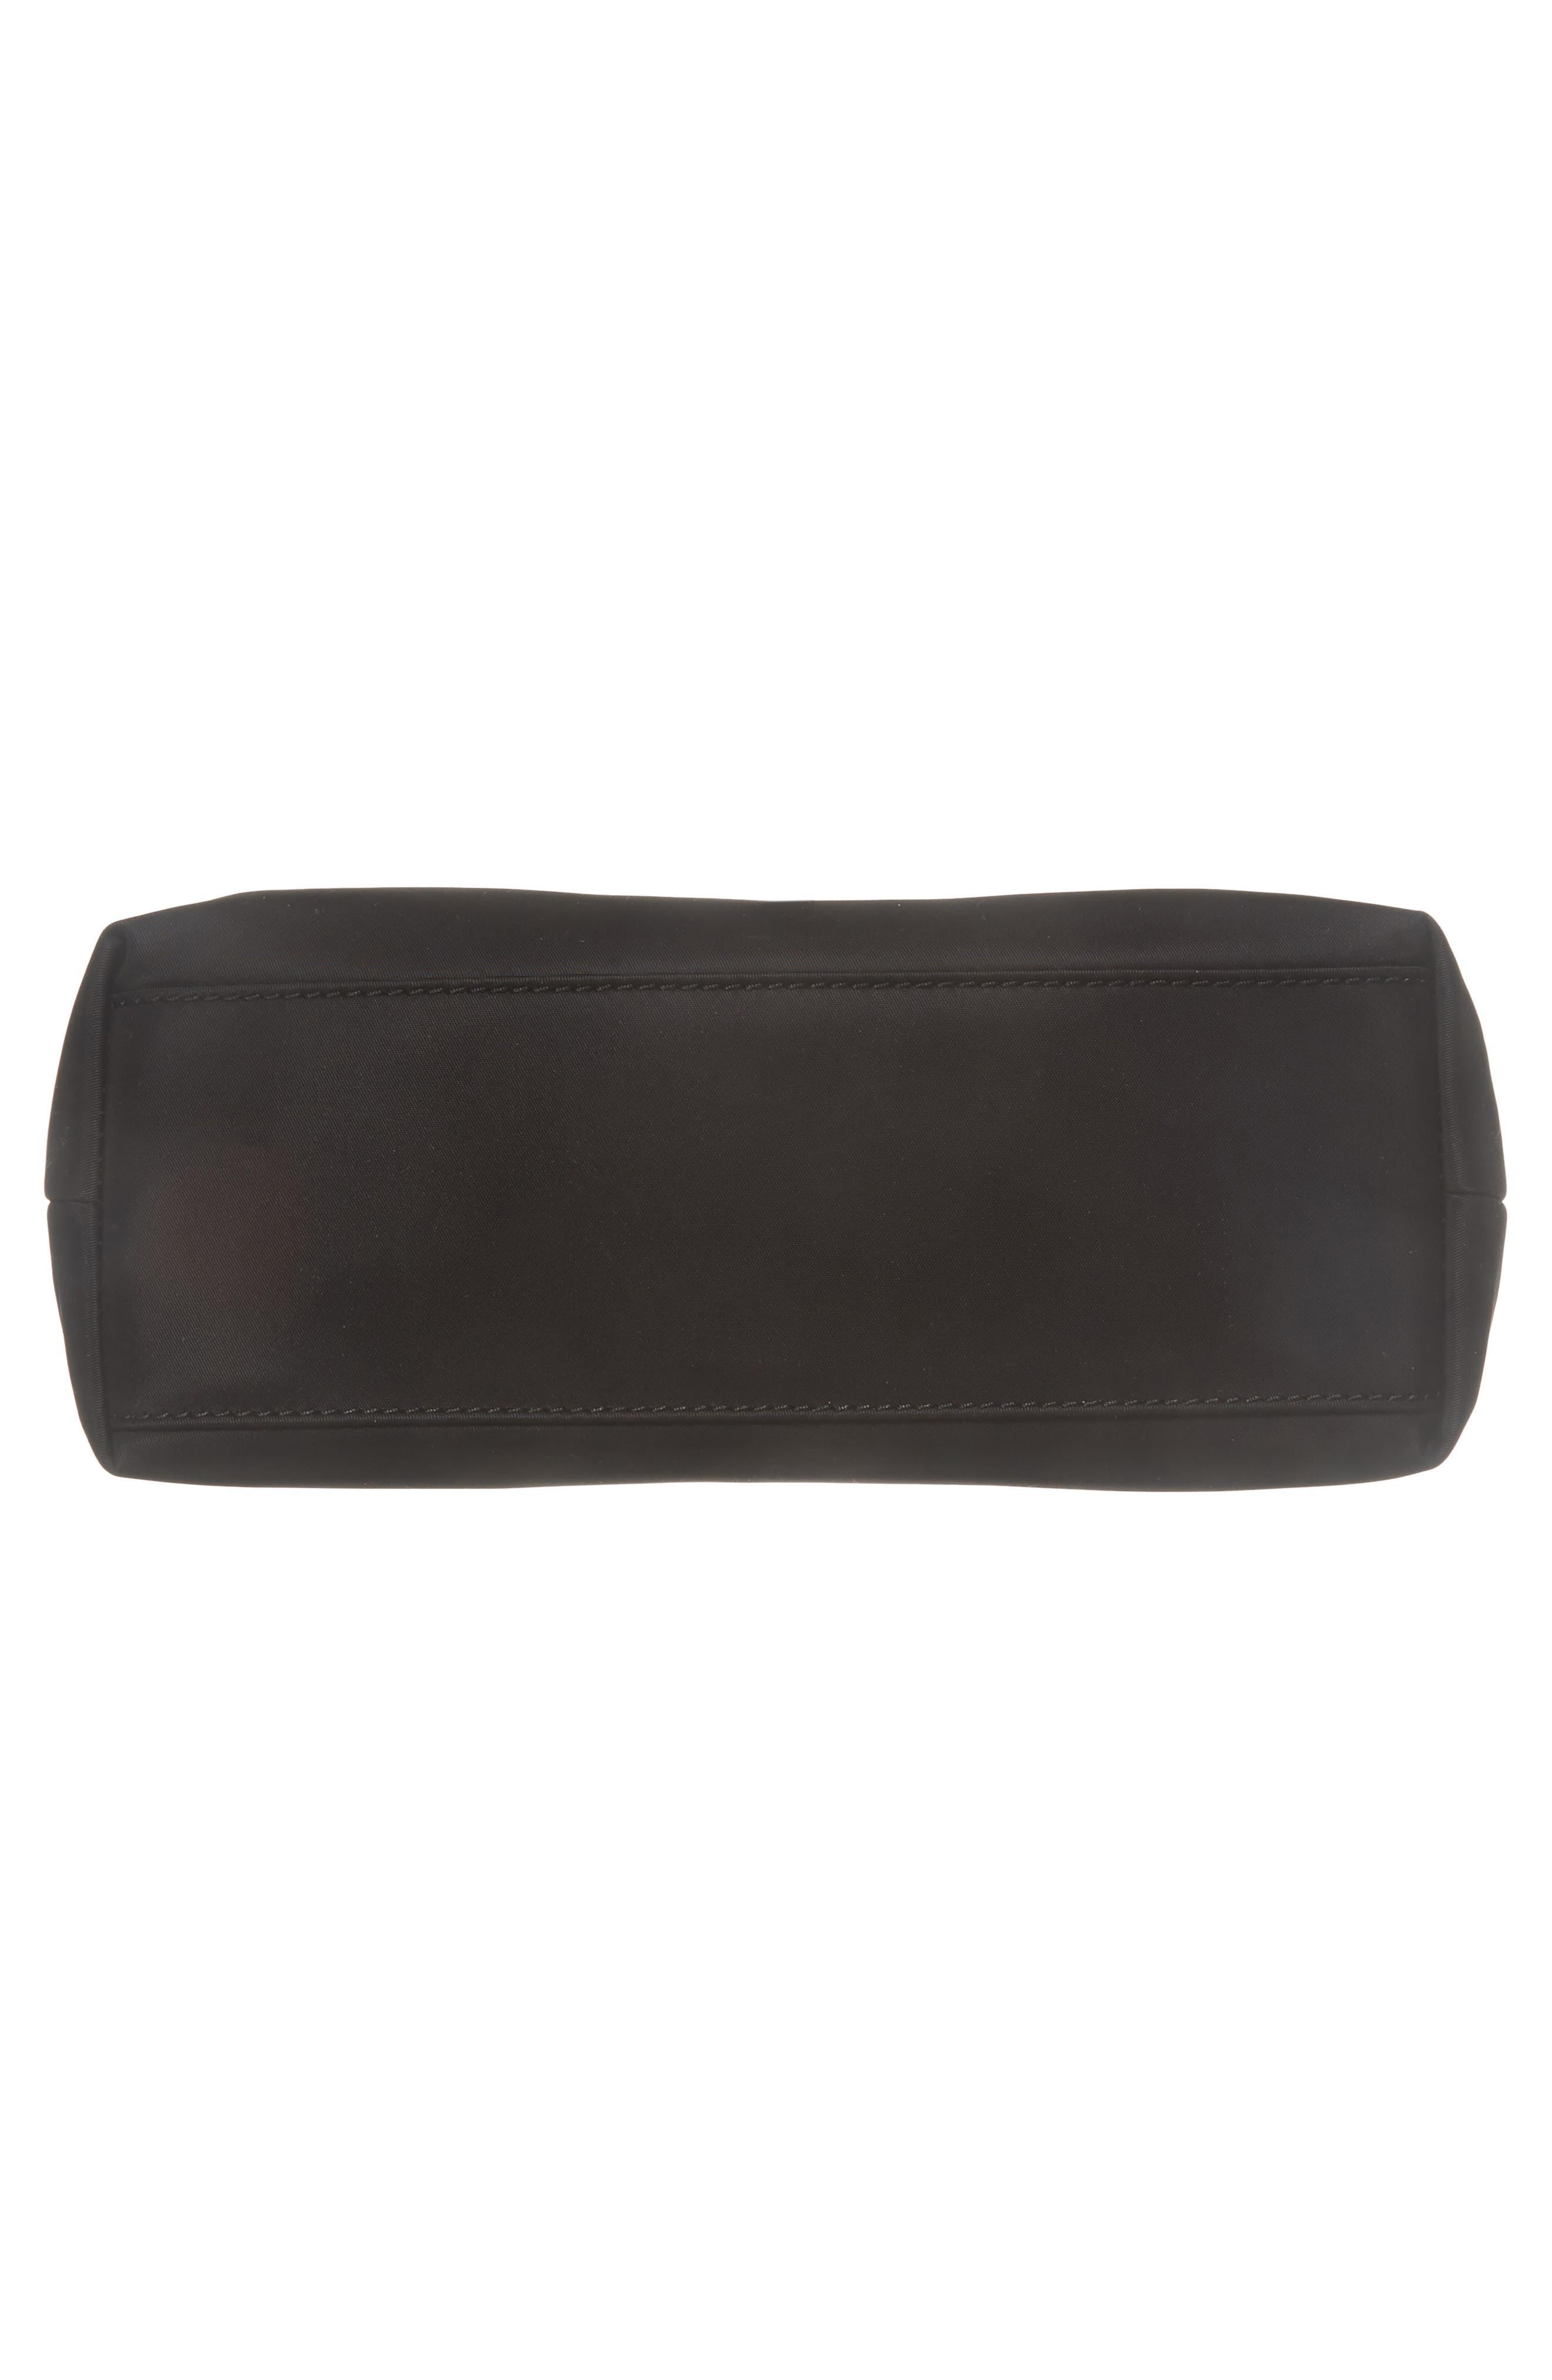 watson lane - lucie nylon crossbody bag,                             Alternate thumbnail 6, color,                             BLACK